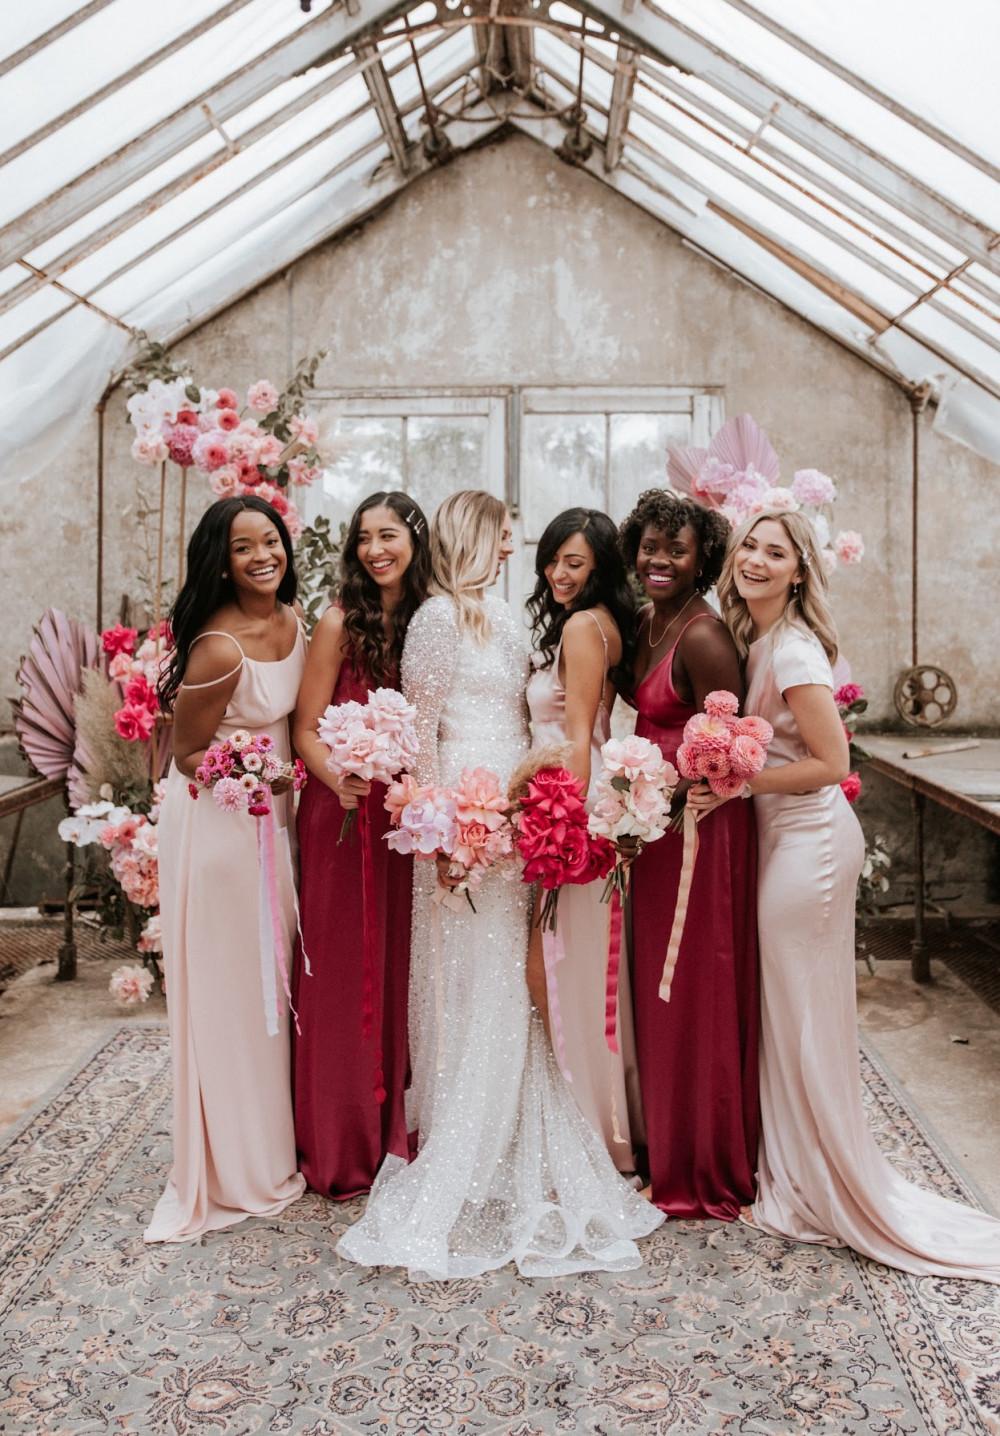 - Make Me Bridal Artist: Abi Taylor Bride. Photography by: Rebecca Carpenter. #bridesmaidhairandmakeup #bride